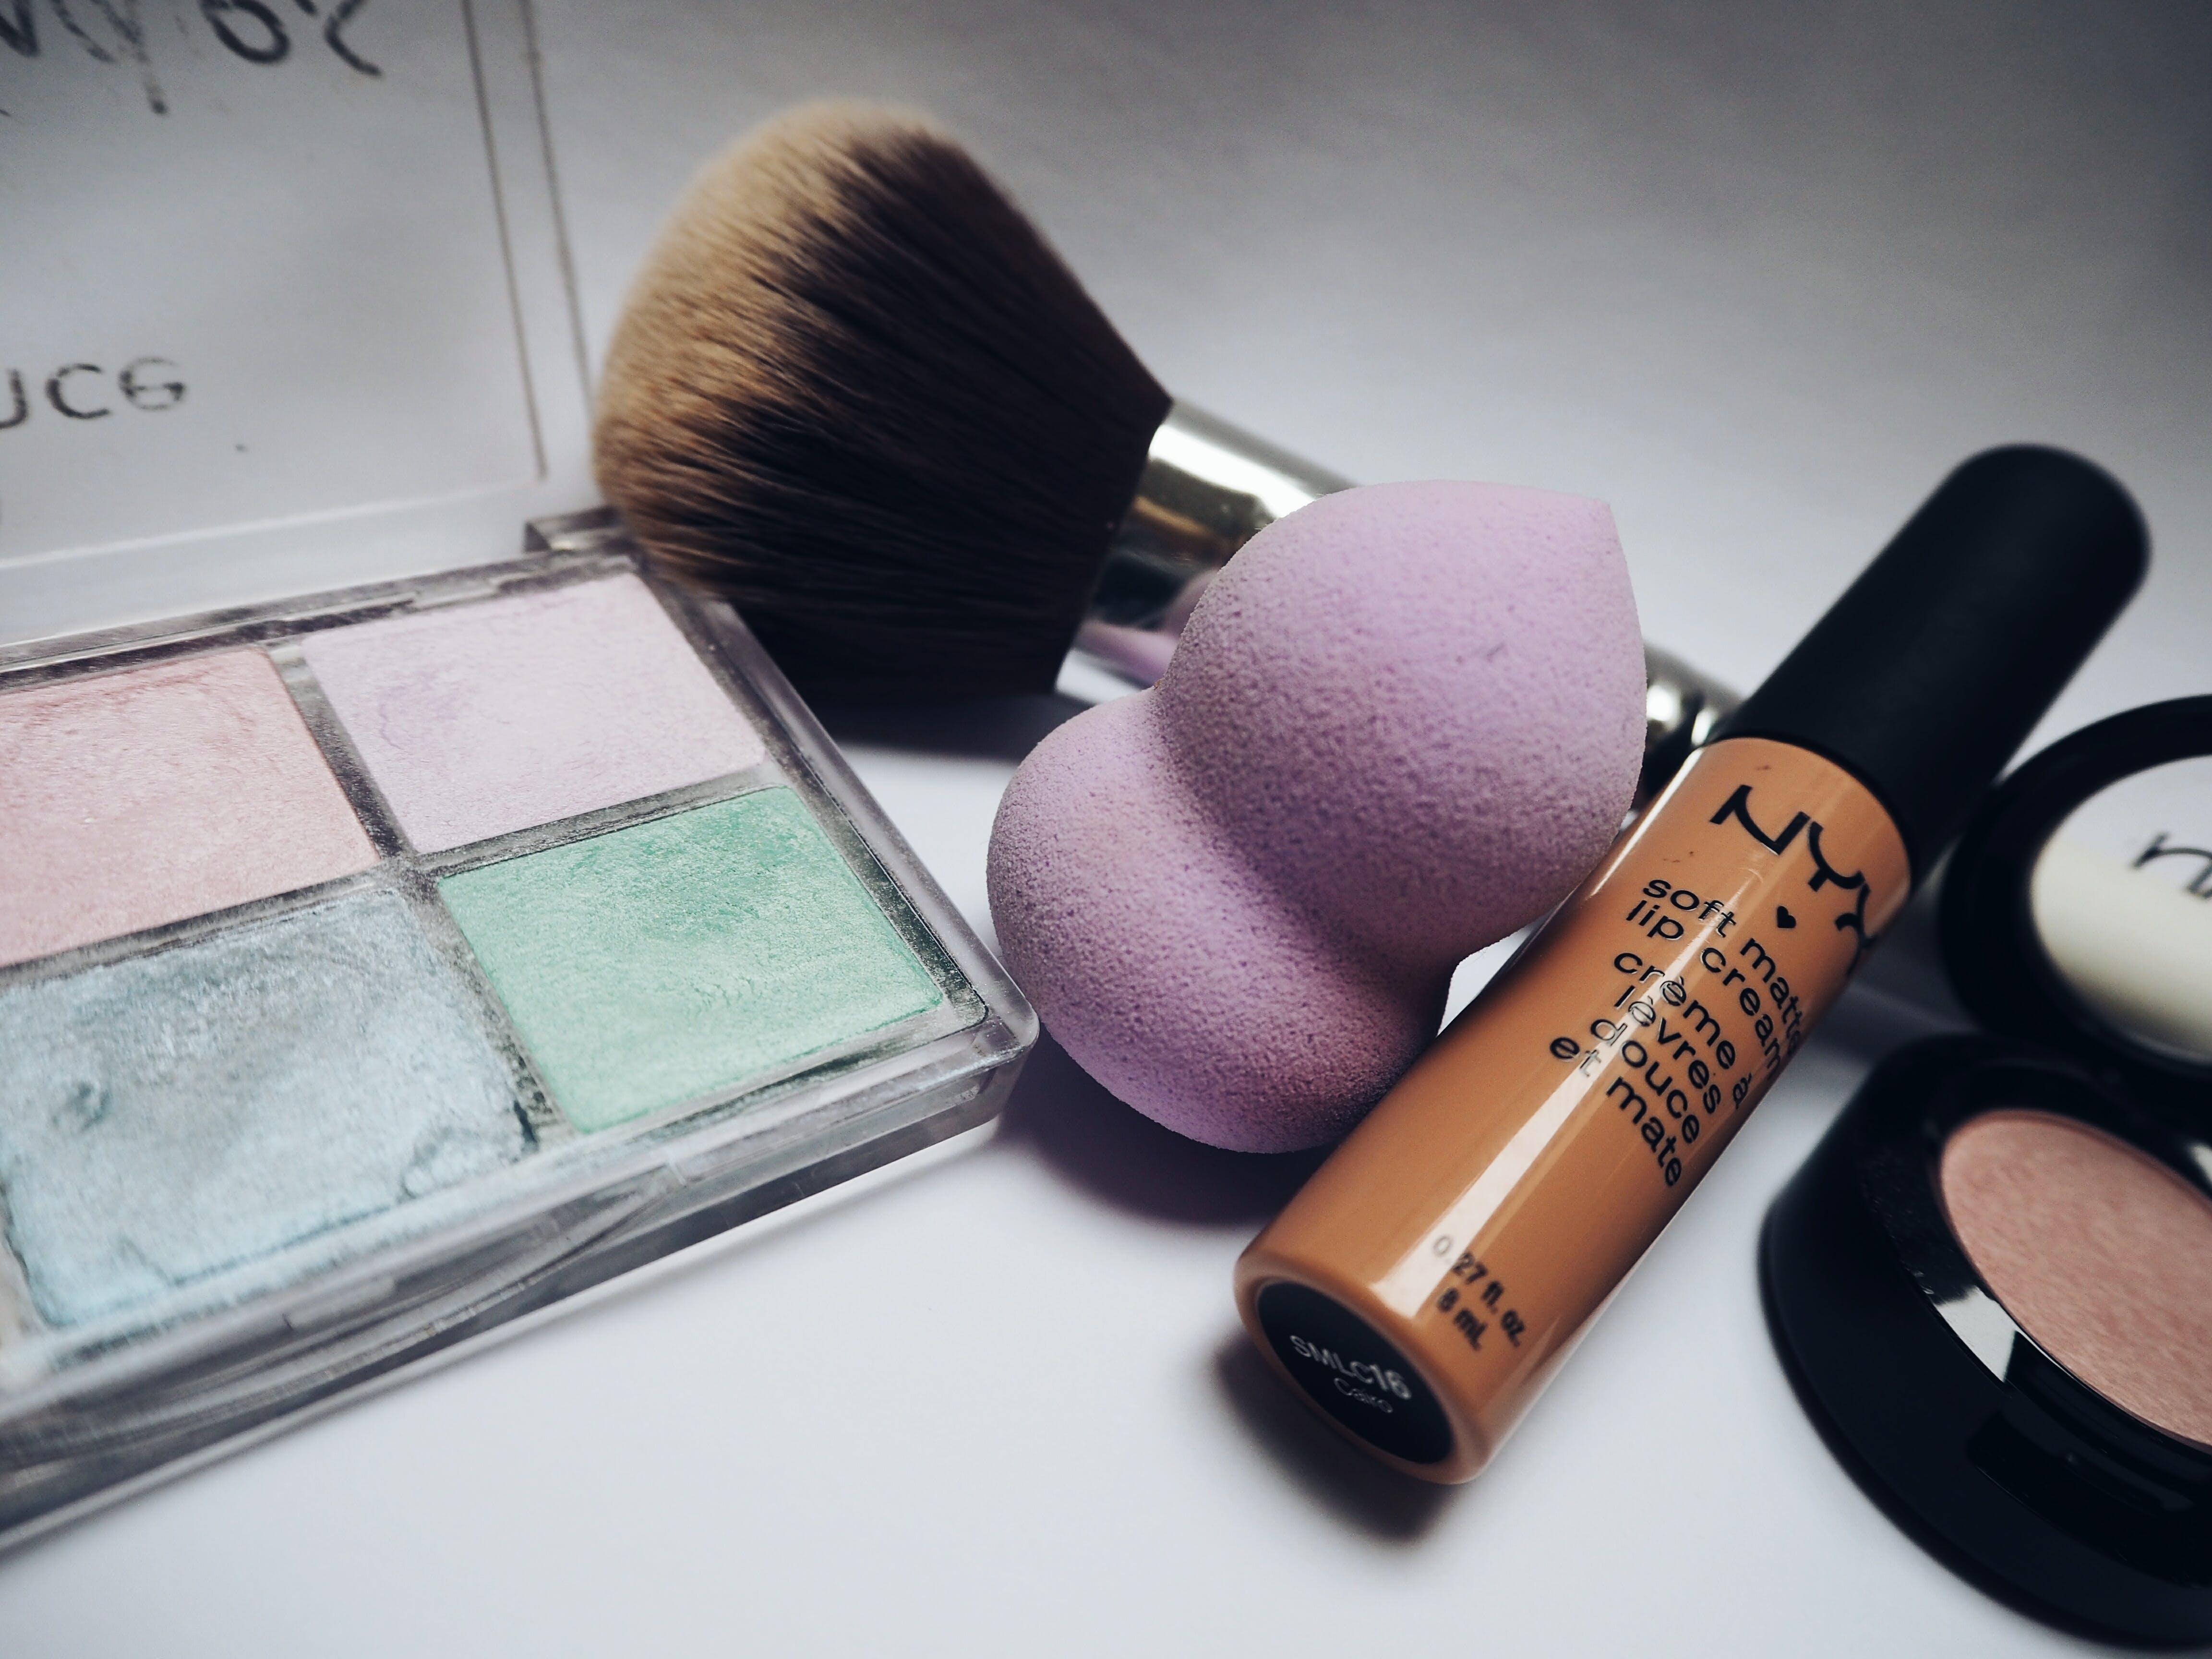 Nyx Lipstick Beside Eye Shadow Palette